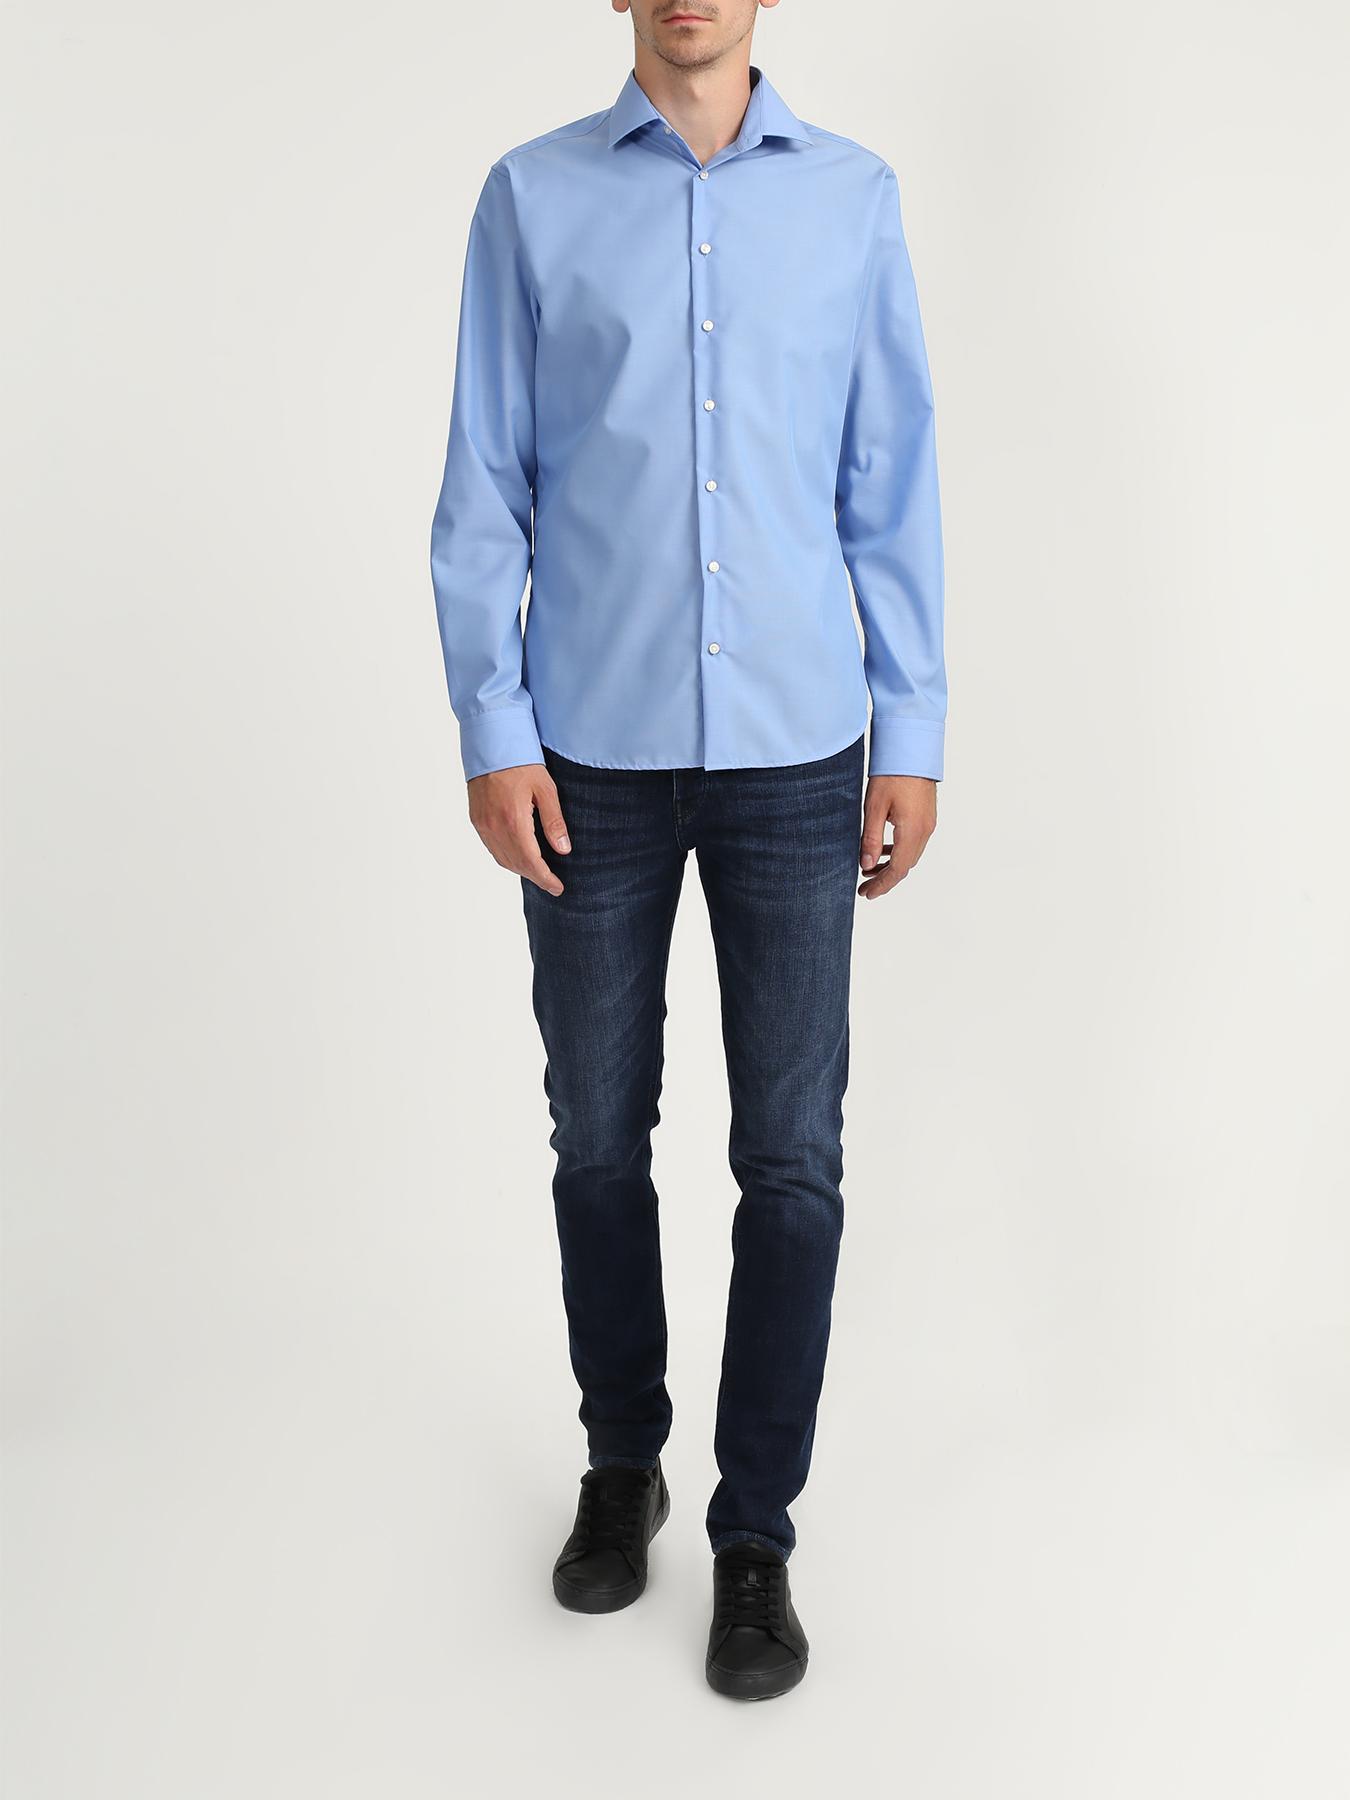 Seidensticker Хлопковая рубашка без карманов 322561-021